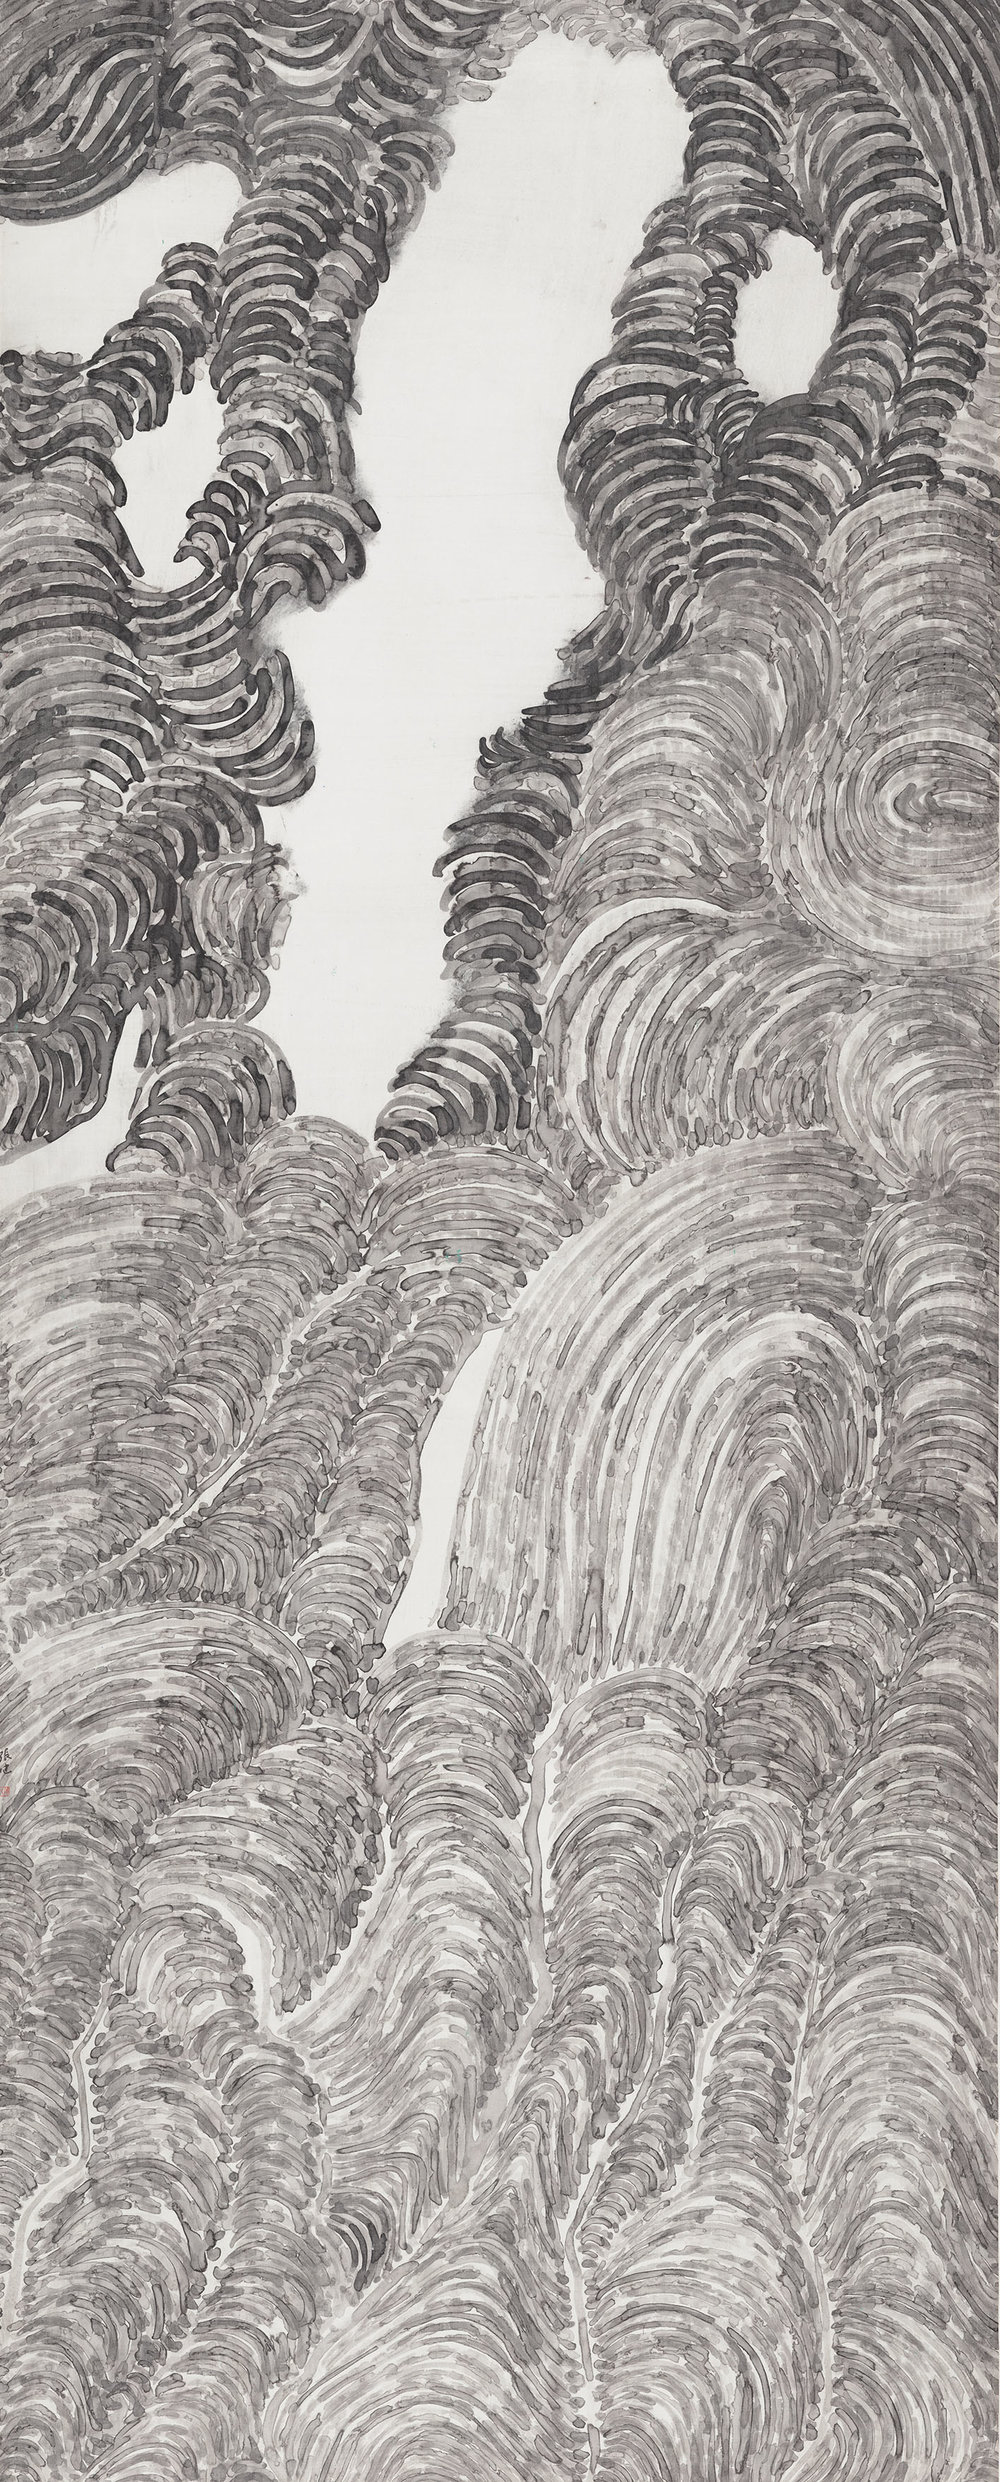 Copy of 山外山系列  纸本设色  212x85cm  2017.jpg